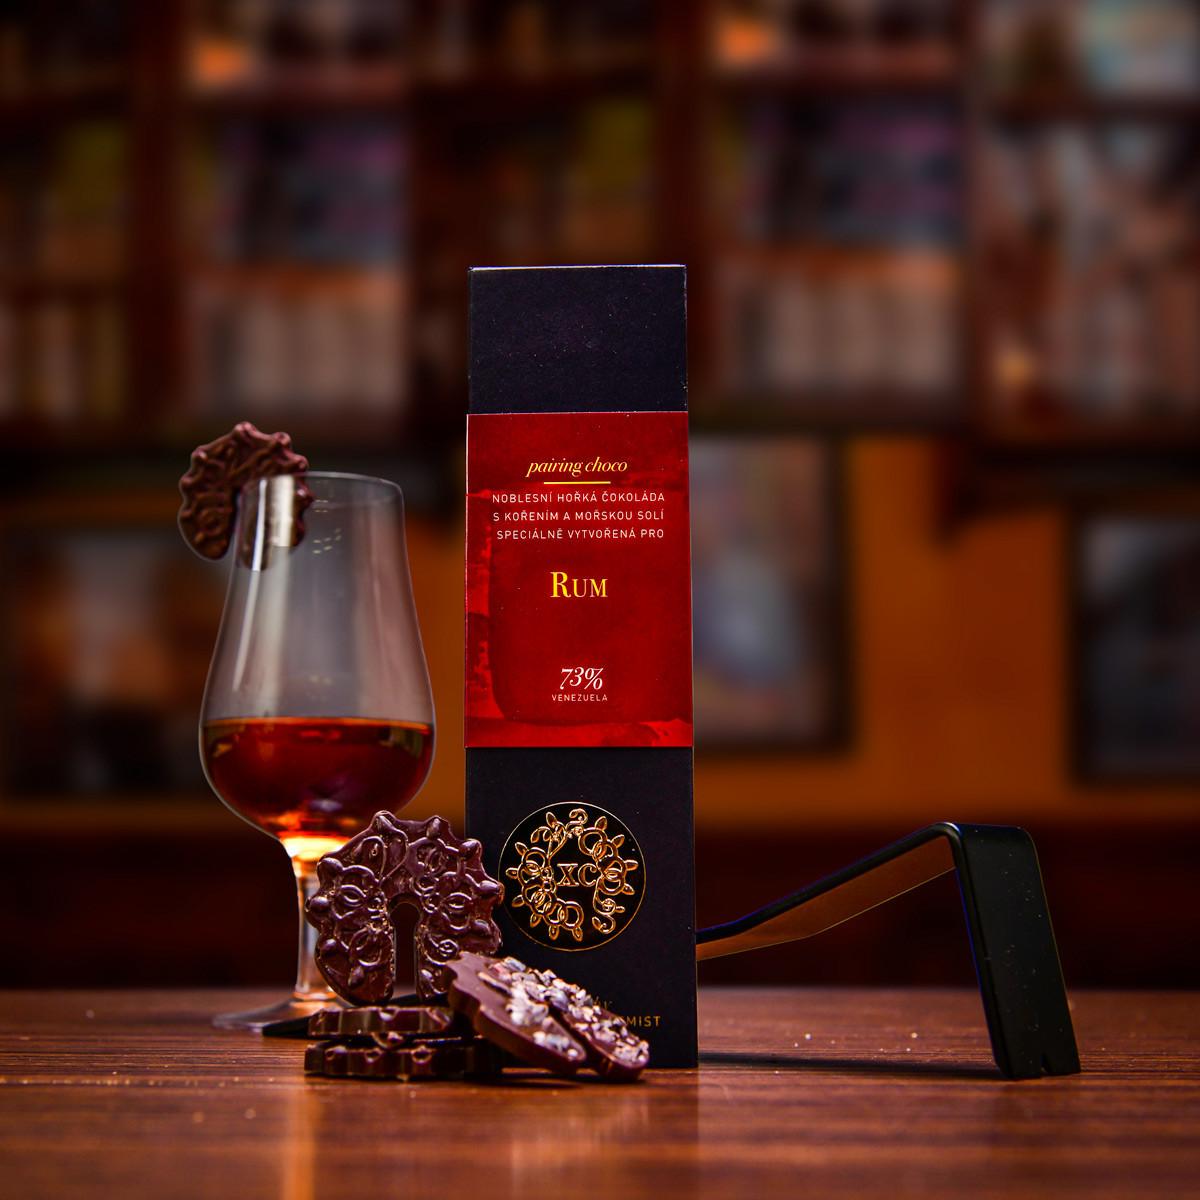 Společné fotografie k bednám s rumem